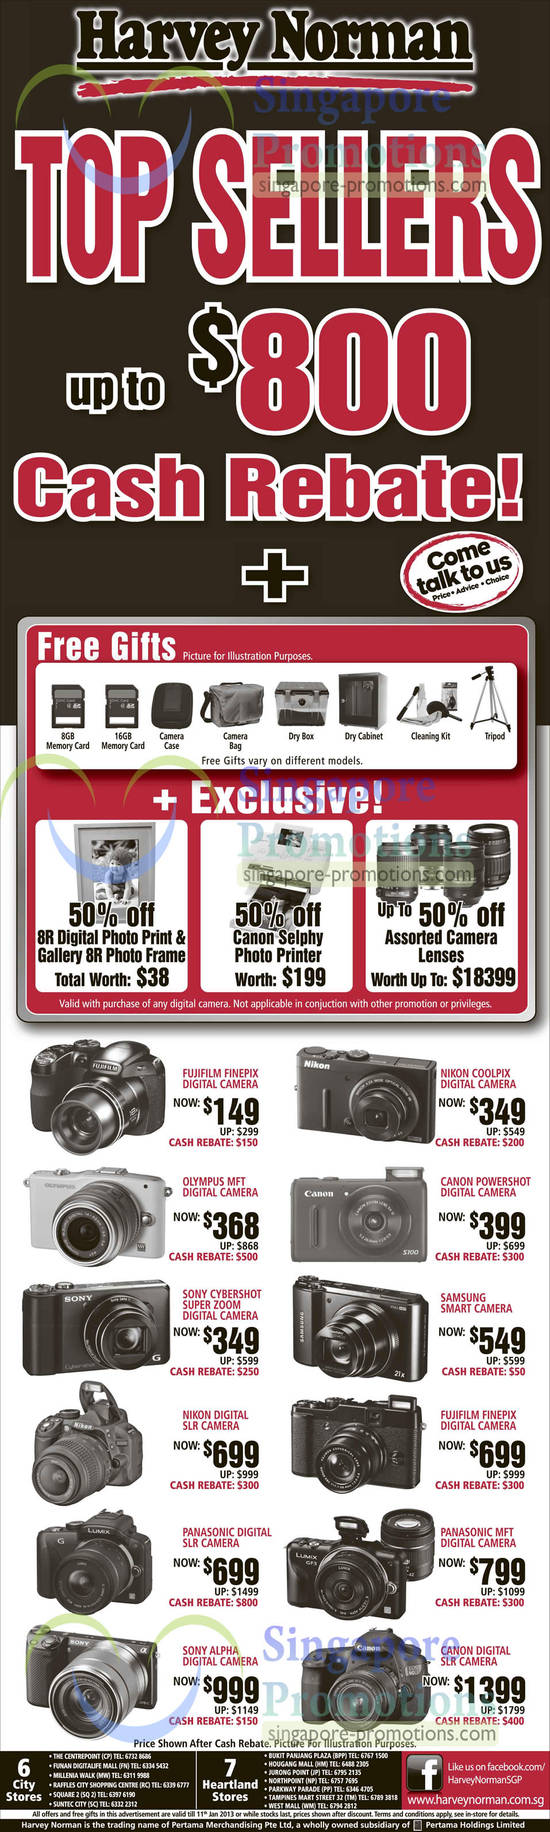 Digital Cameras, Fujifilm, Nikon, Canon, Olympus, Sony, Samsung, Panasonic